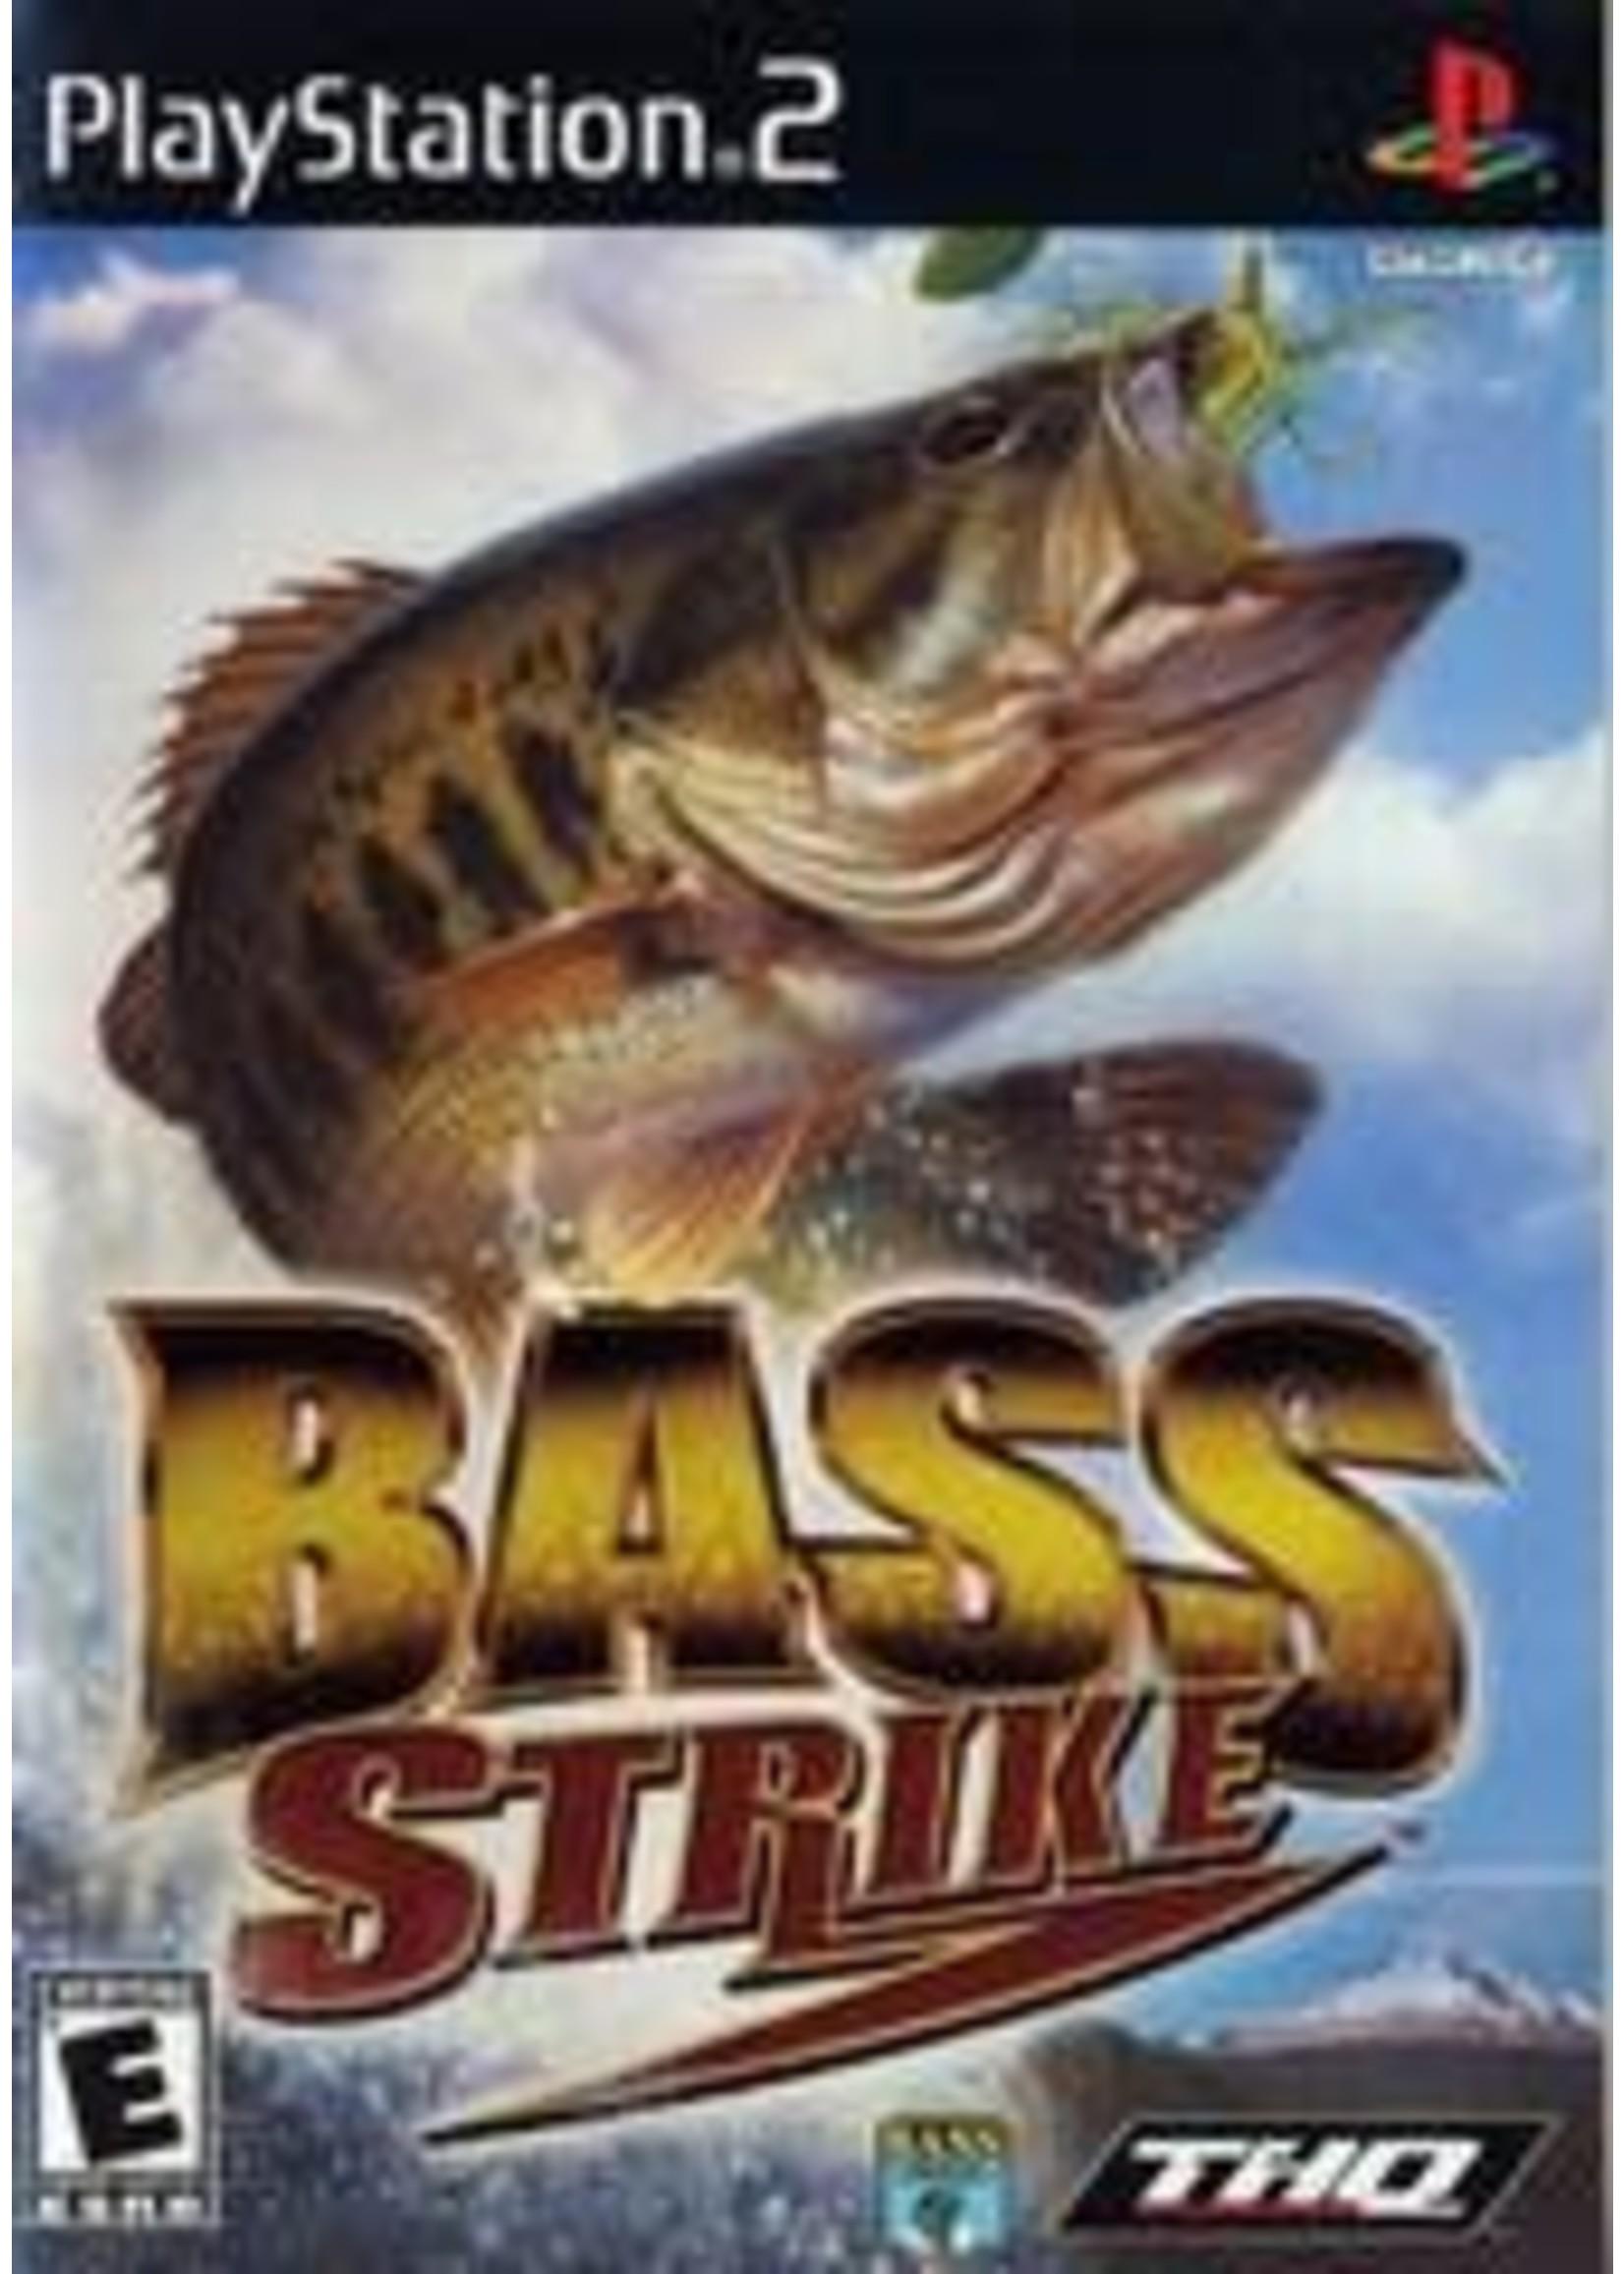 Bass Strike Playstation 2